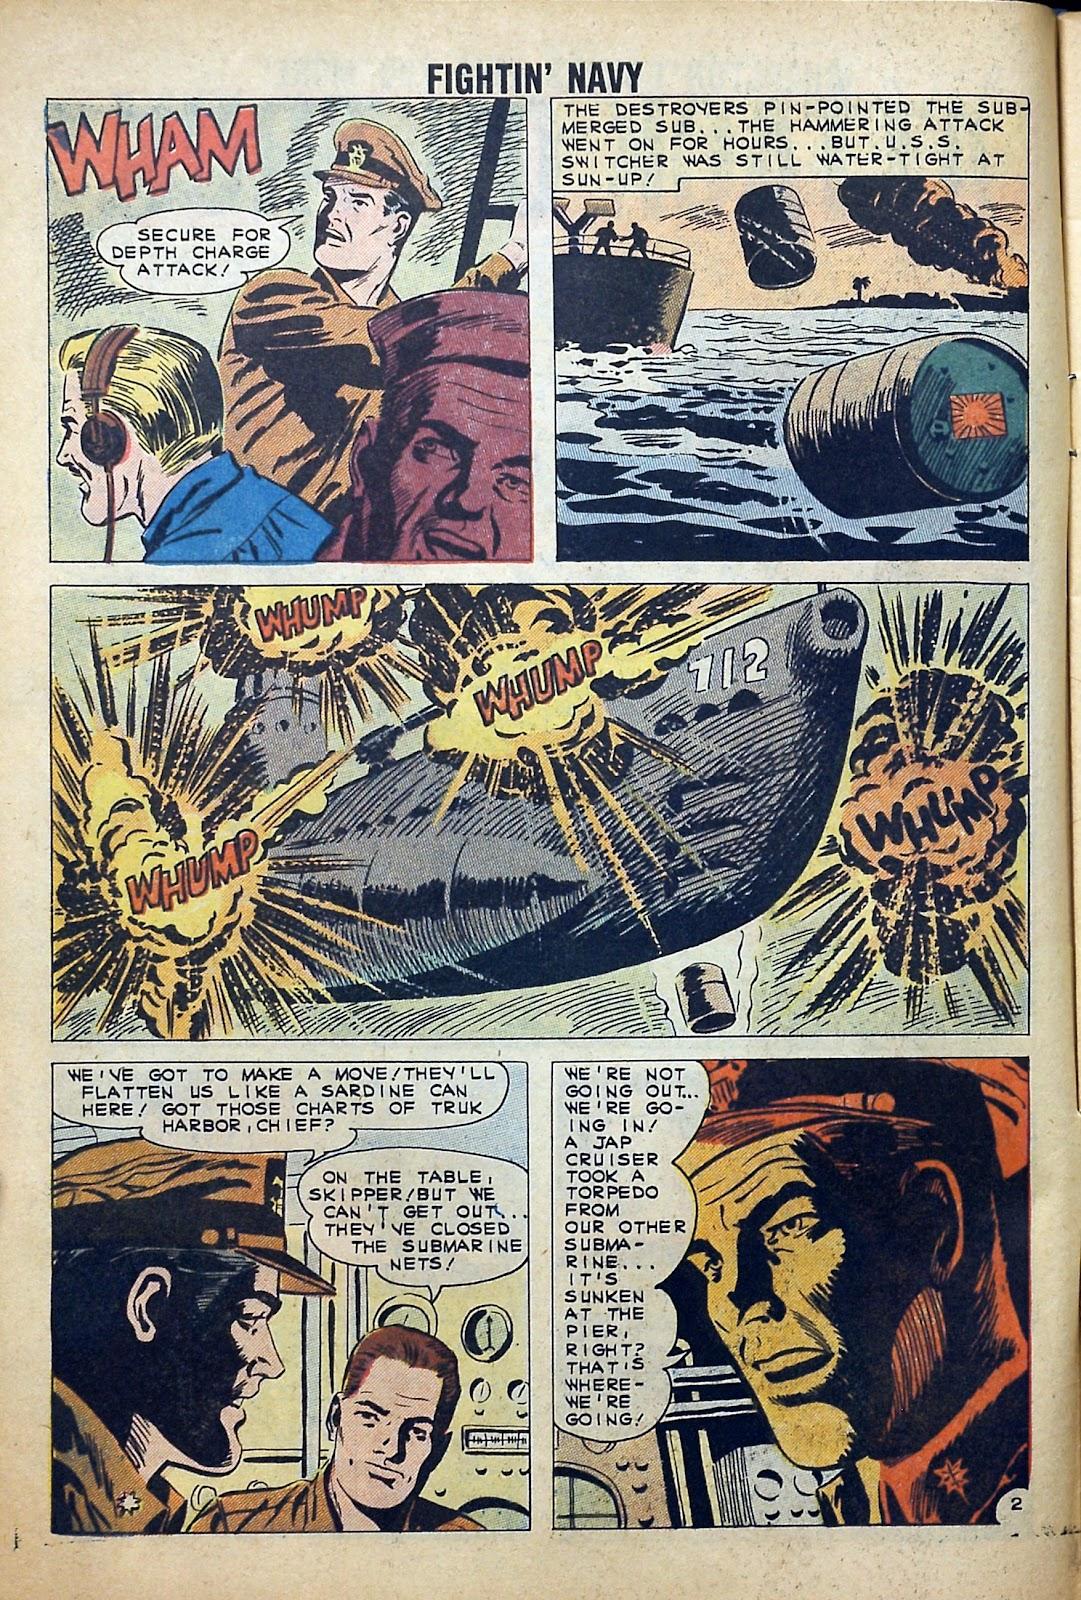 Read online Fightin' Navy comic -  Issue #99 - 4